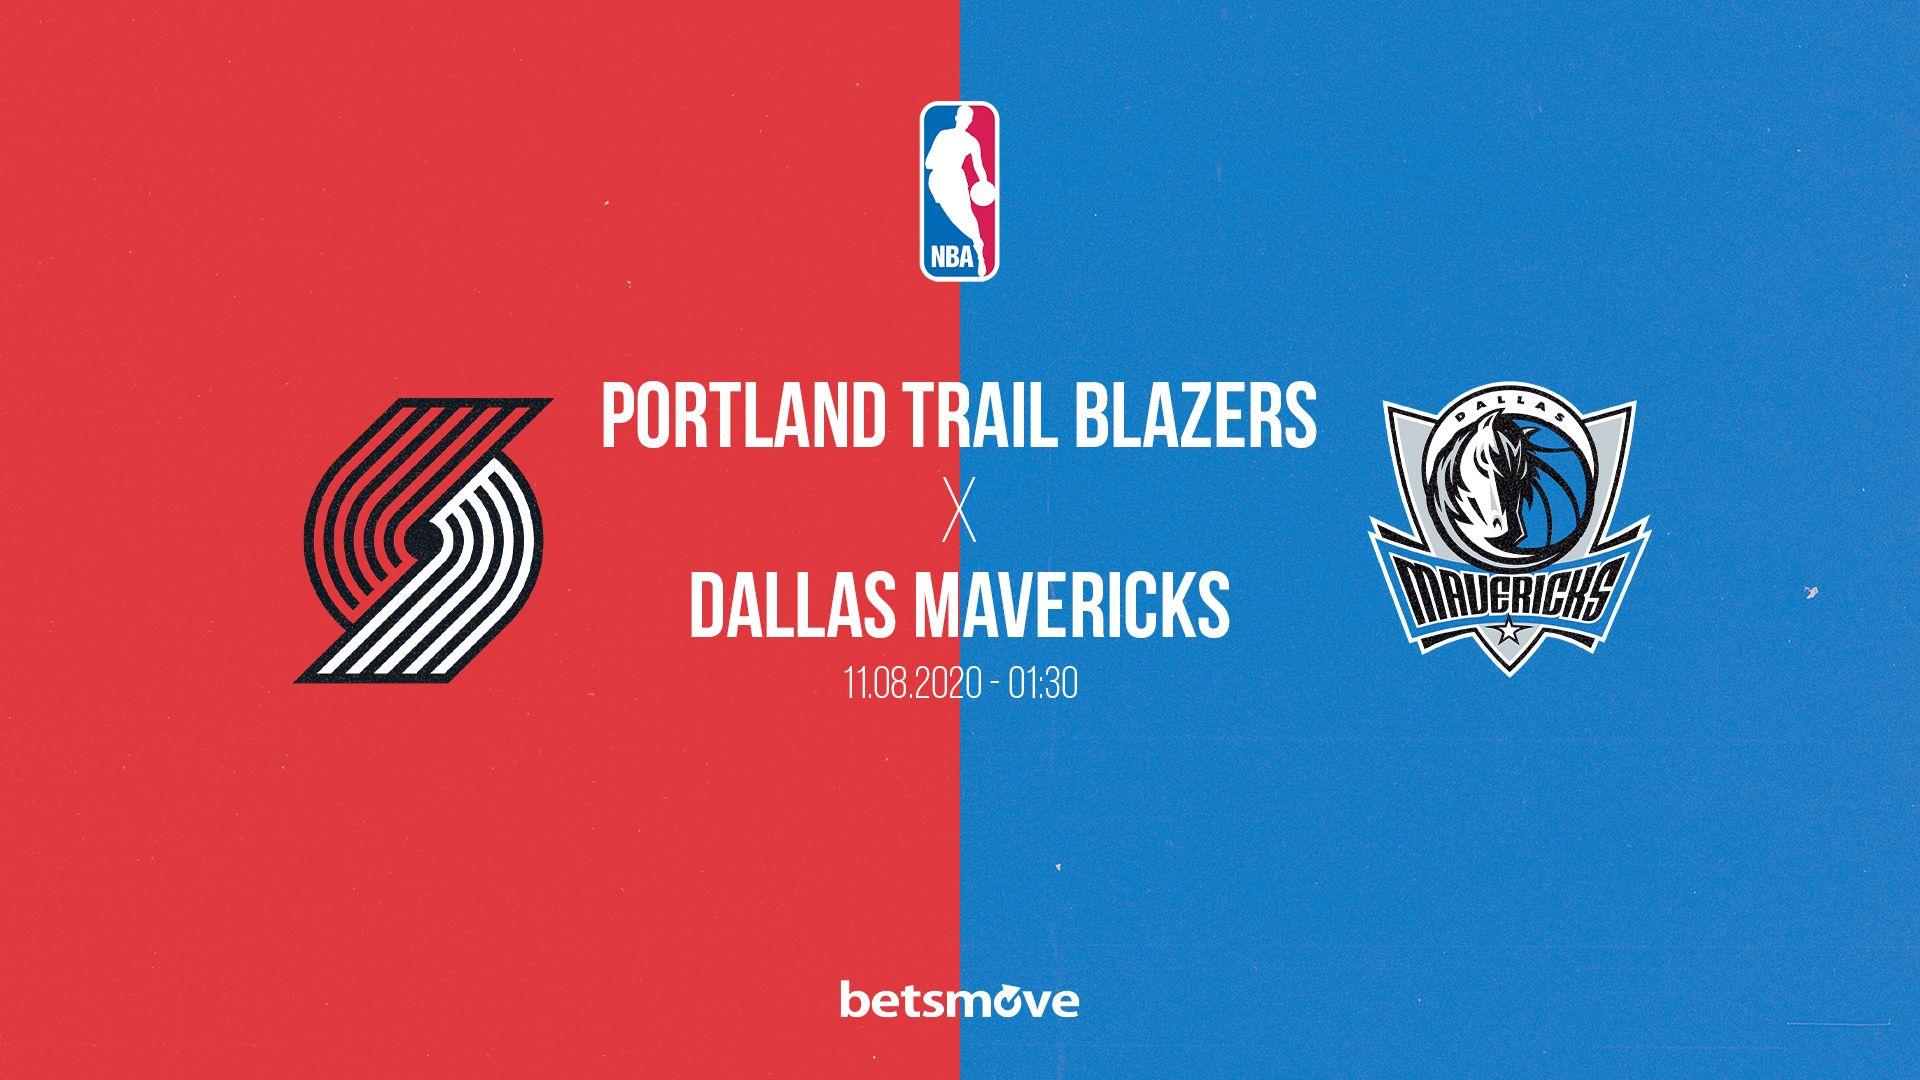 Portland Trail Blazers Dallas Mavericks Canli Izle 2020 Dallas Mavericks Blazers Dallas